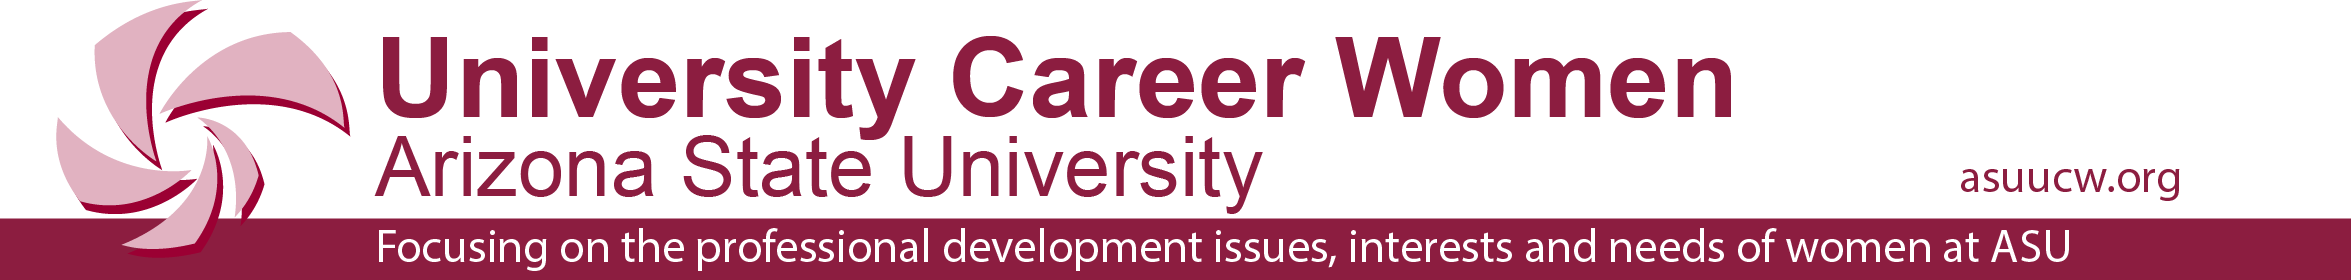 UCW Banner logo